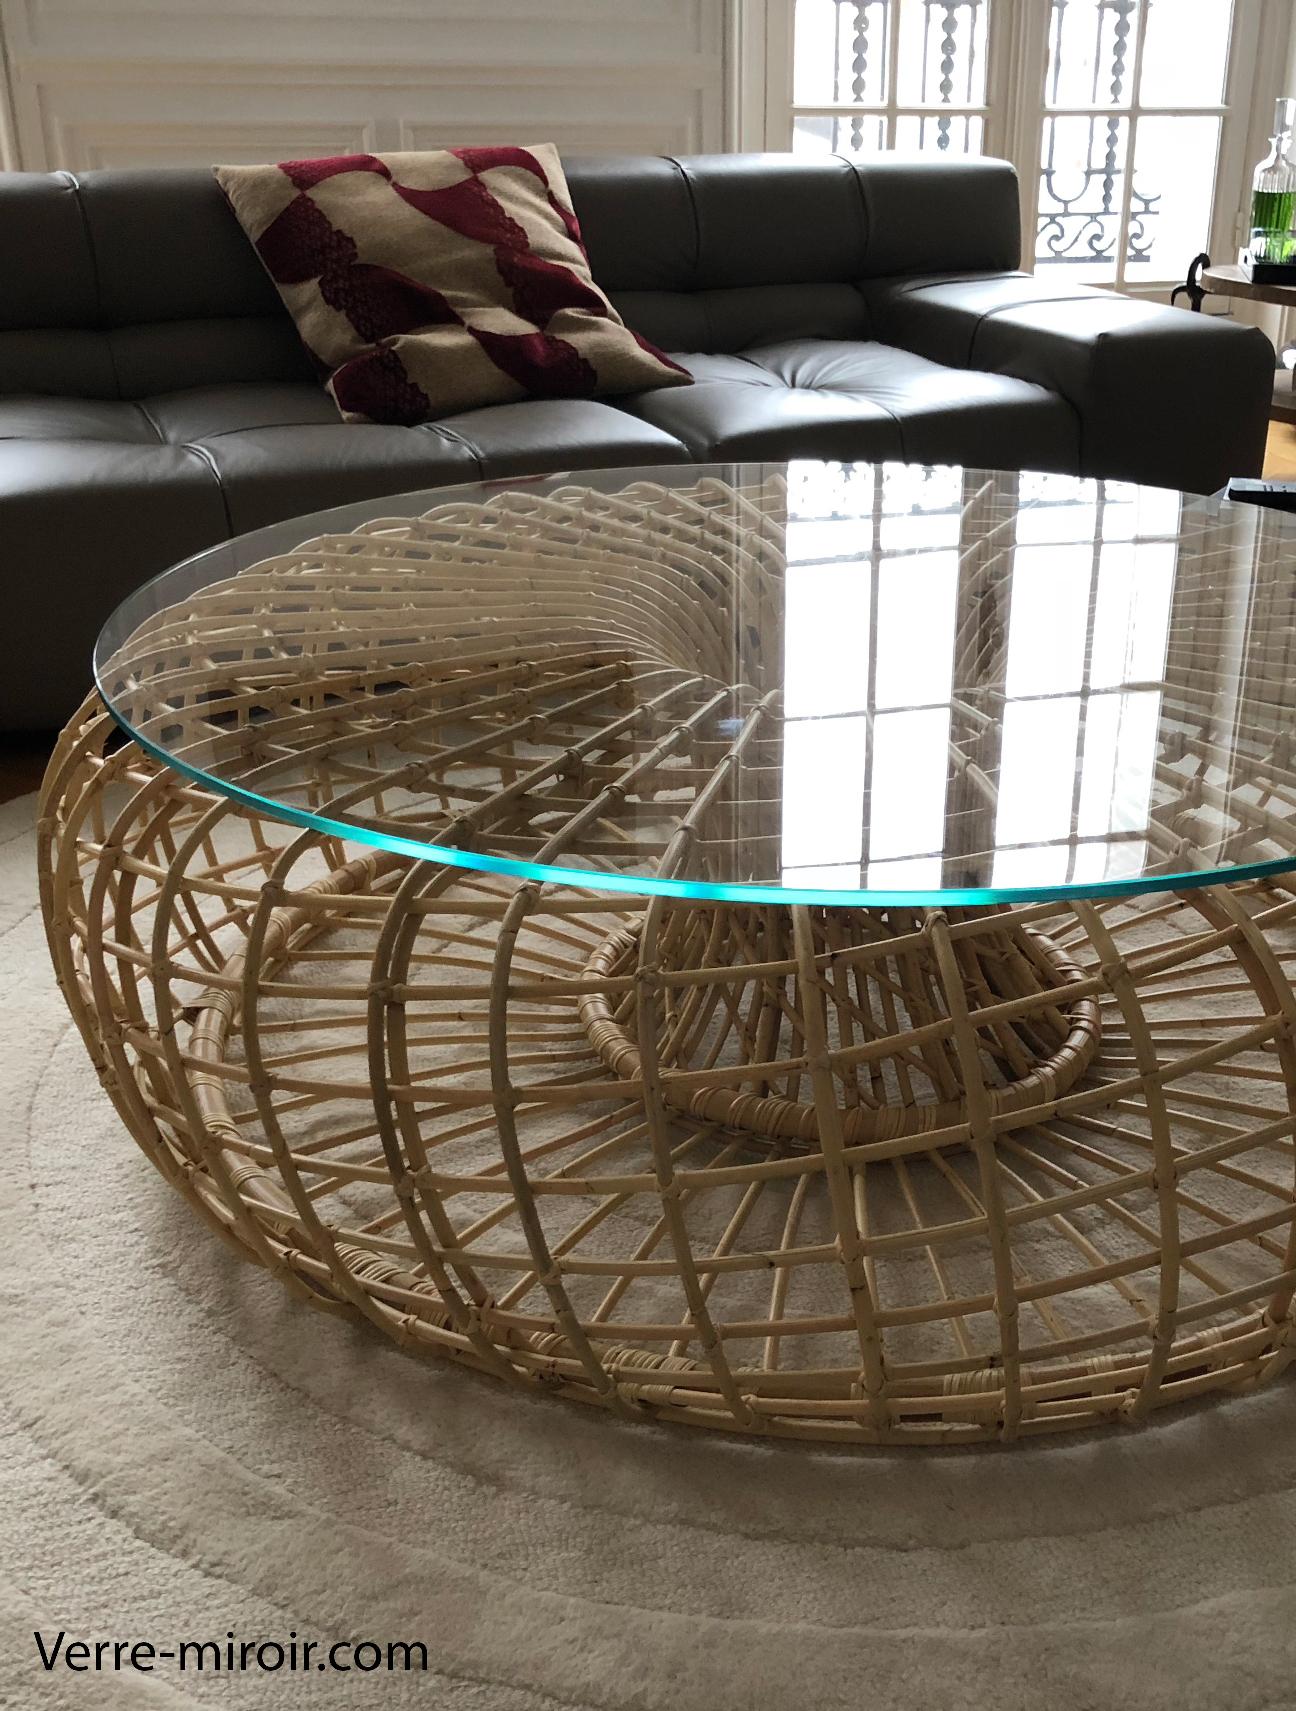 Verre trempe extra clair sur table basse